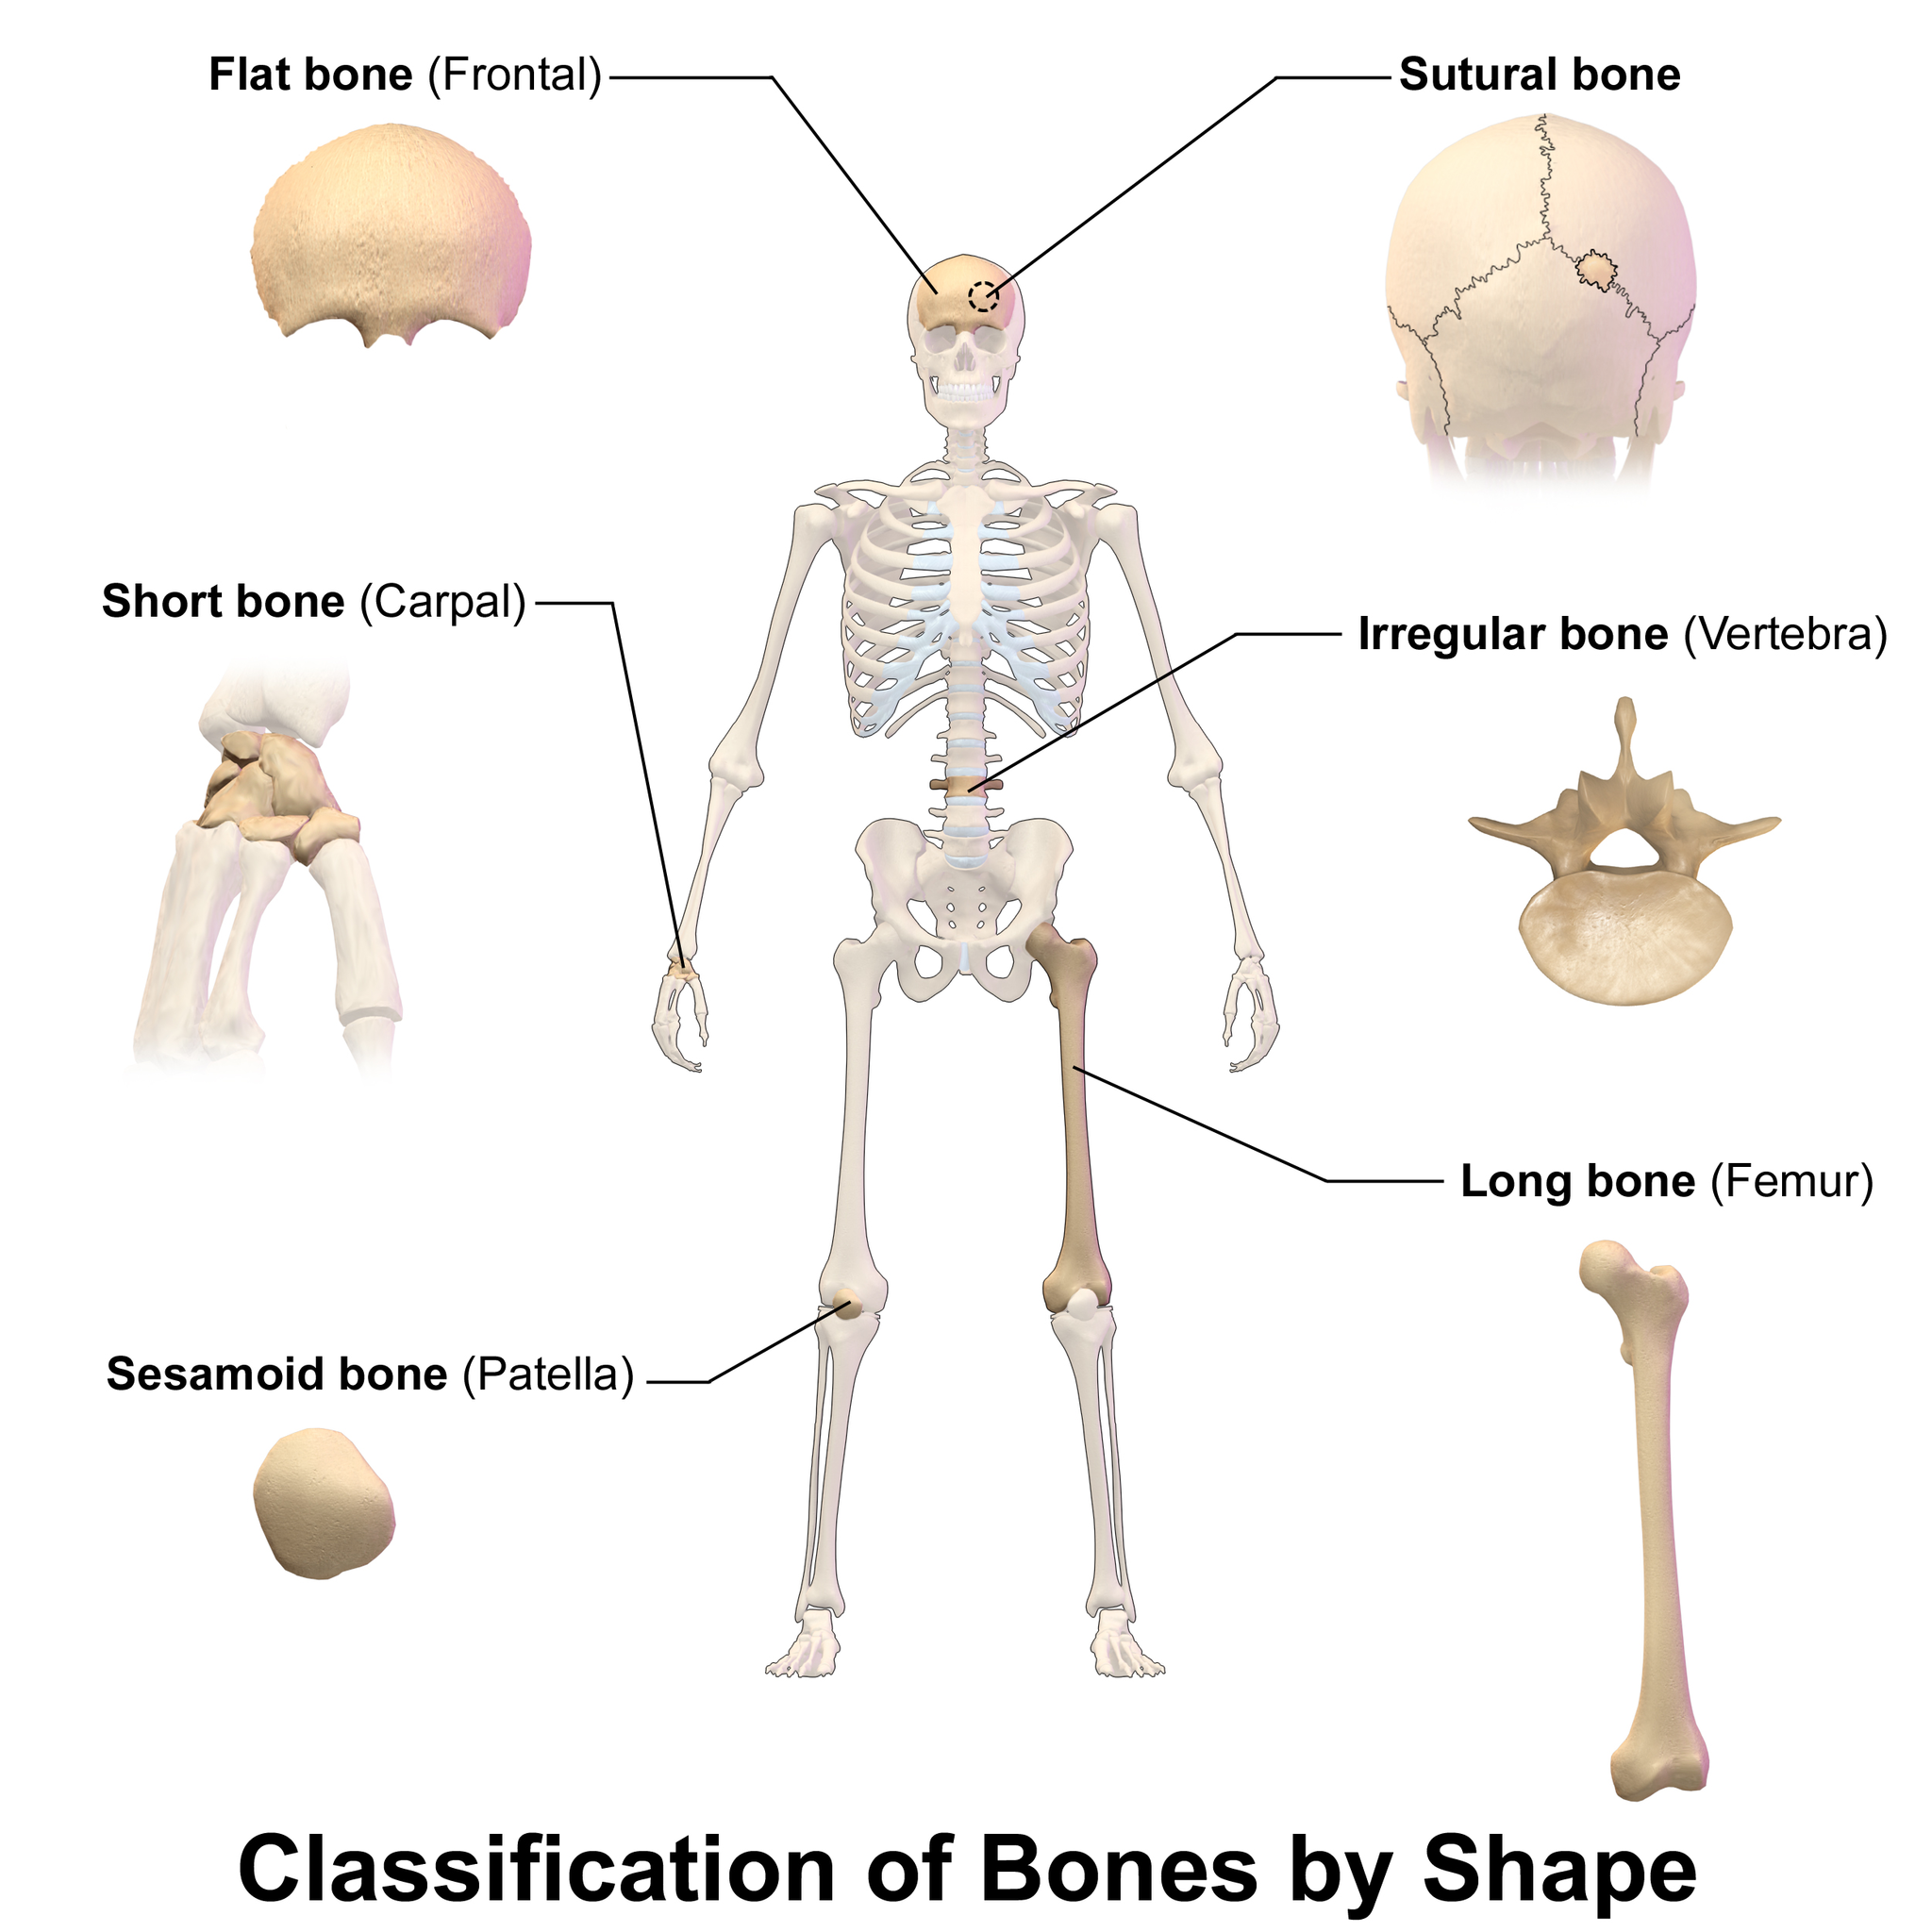 11.4.7 Bone Types of the Body